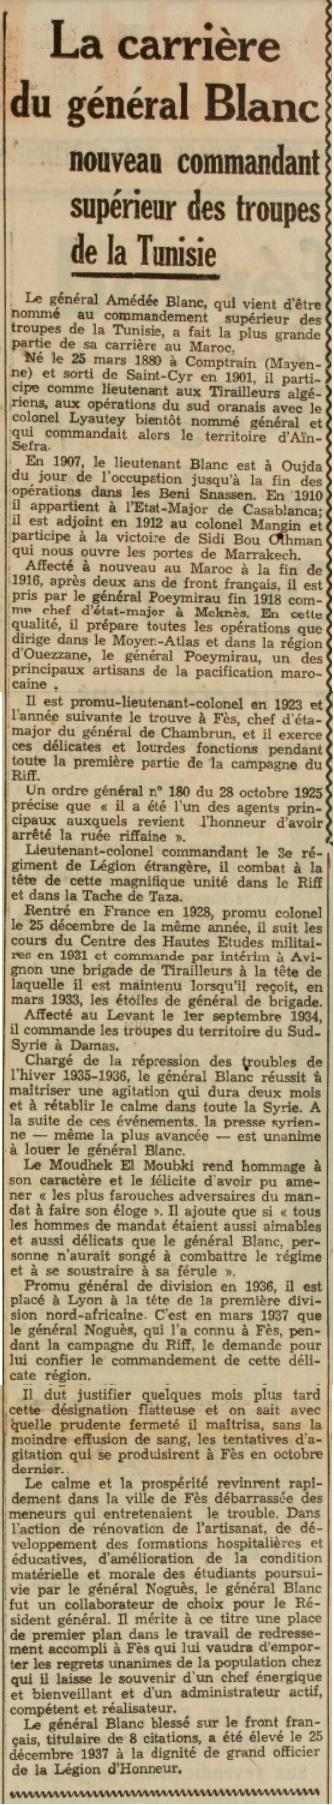 Général Blanc Amédée-Ferdinand-Auguste Gzonz477